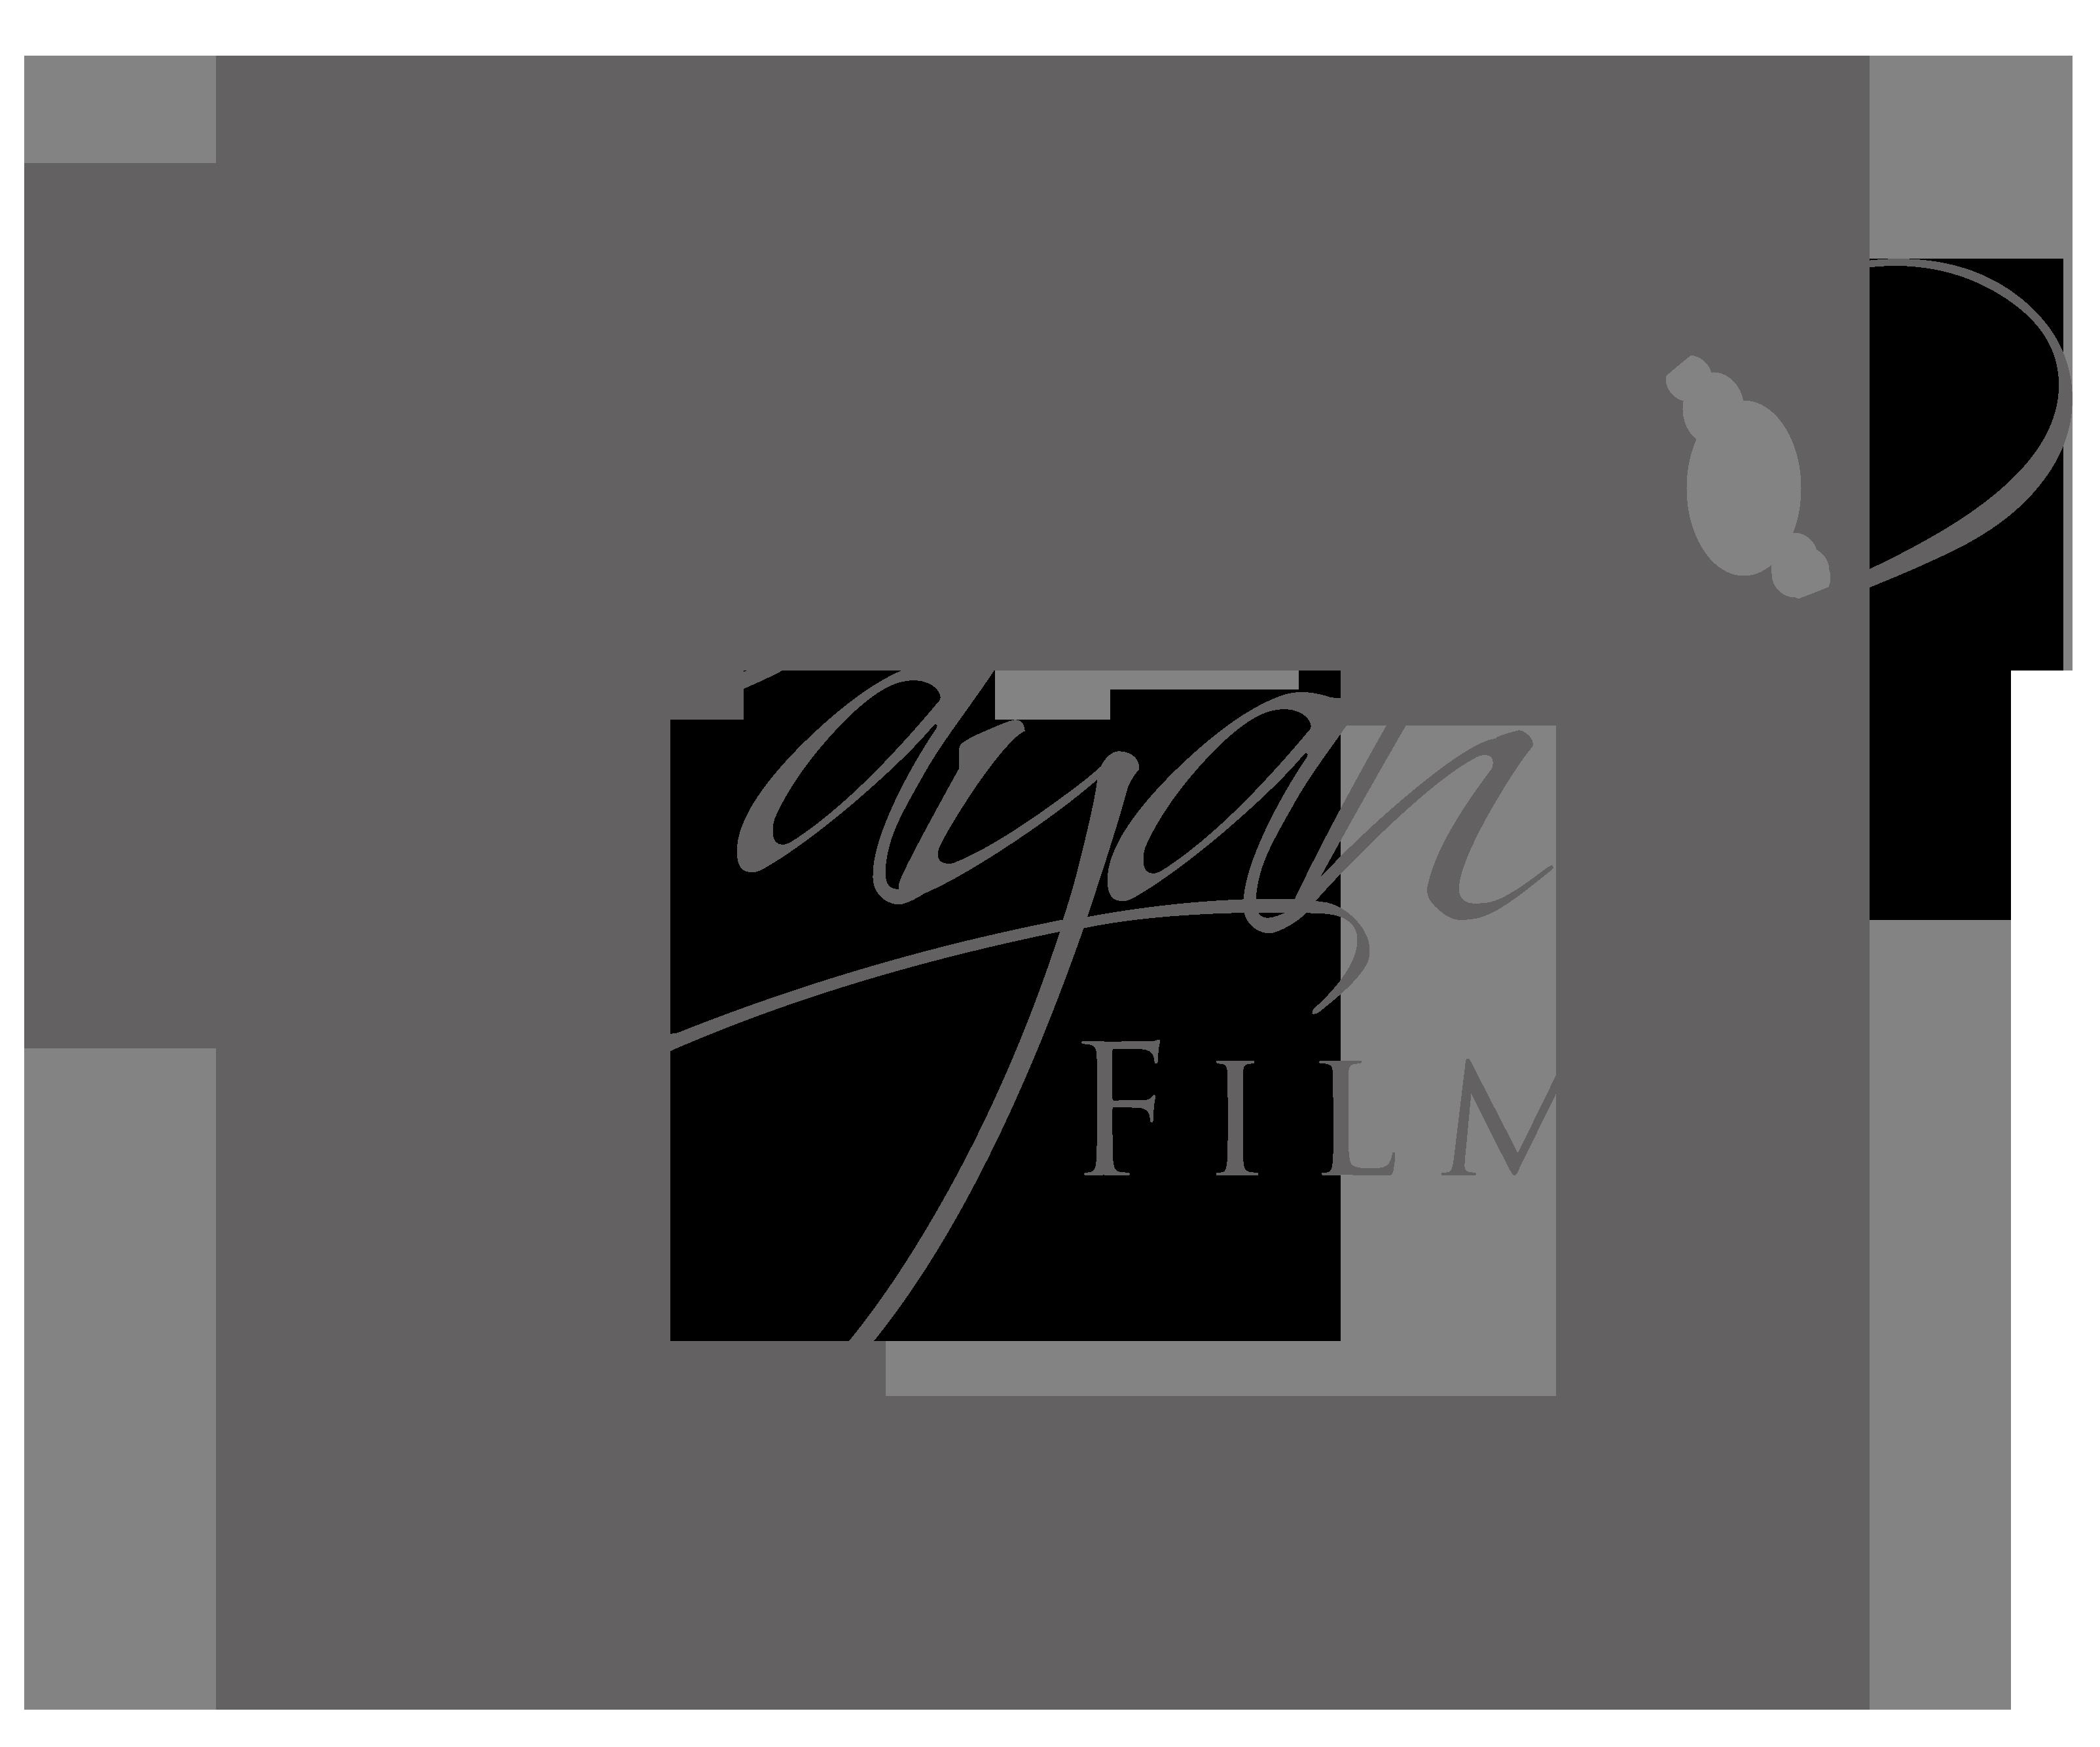 Rayah Films logo